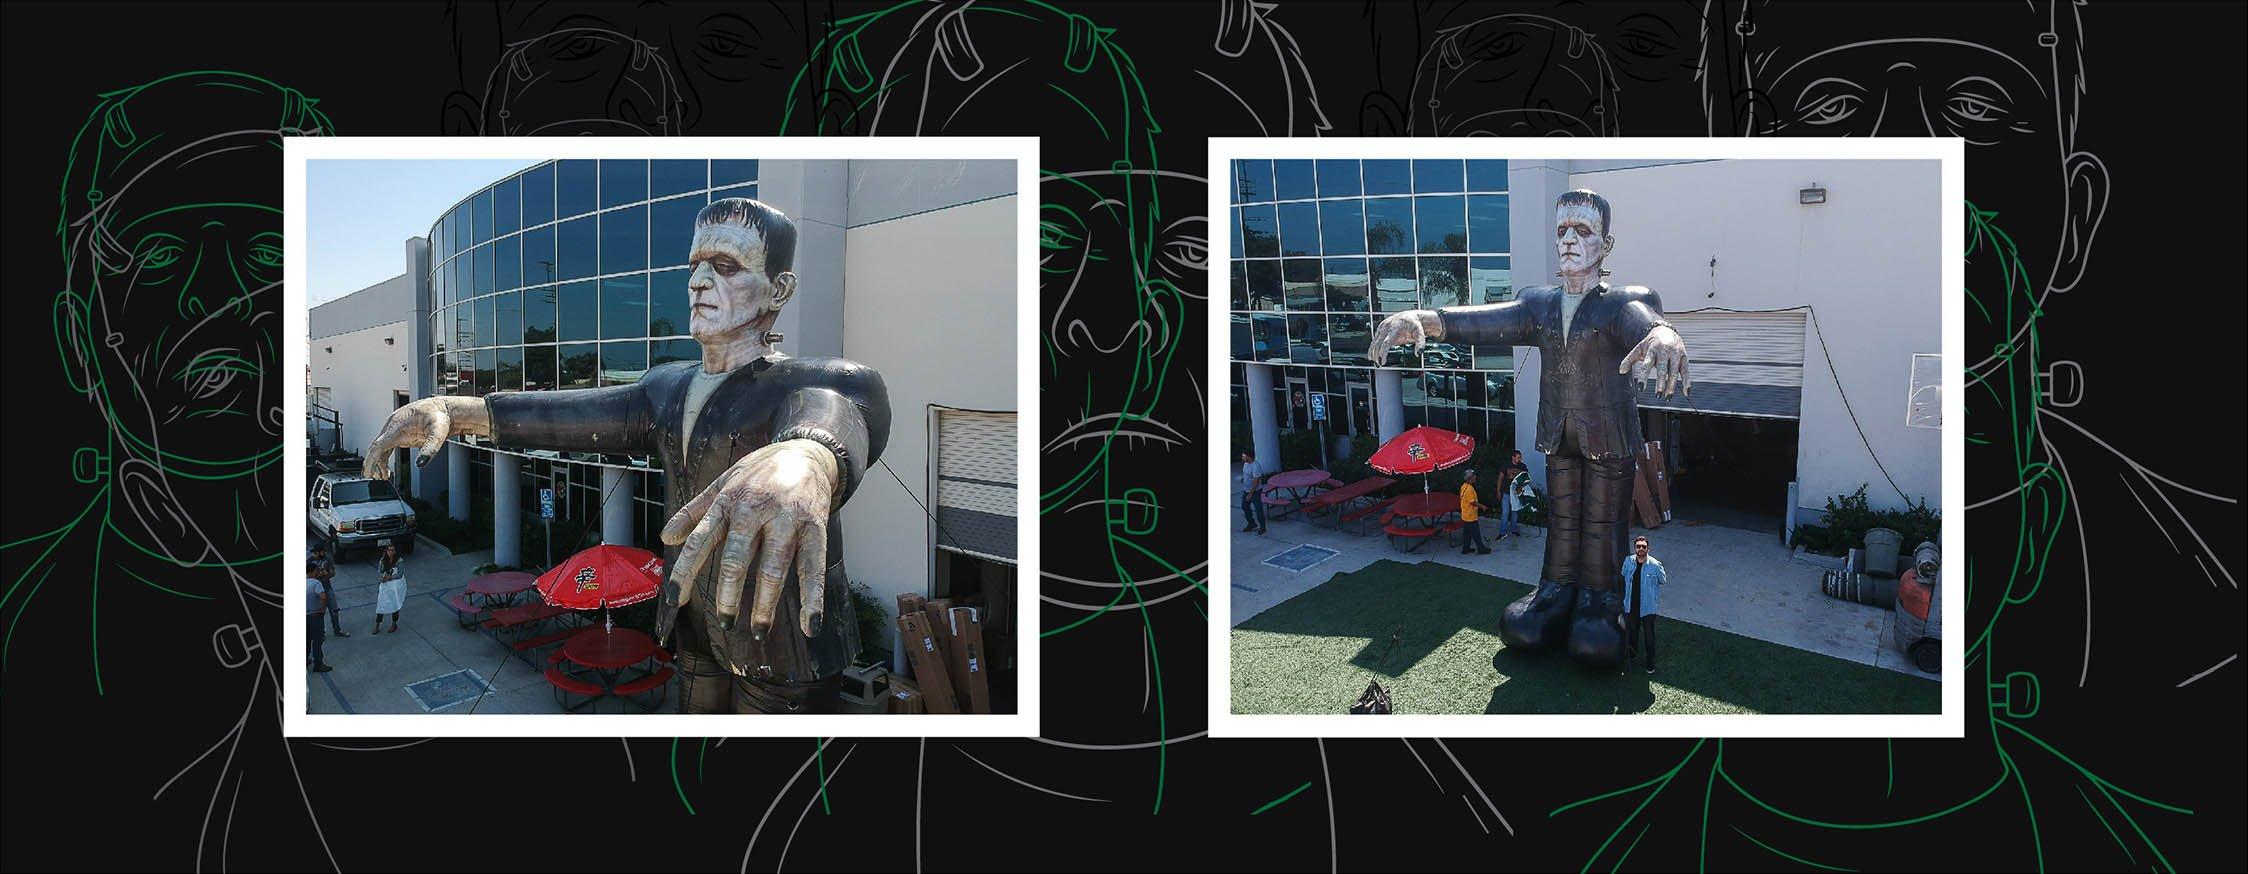 Frankenstein-header.jpg